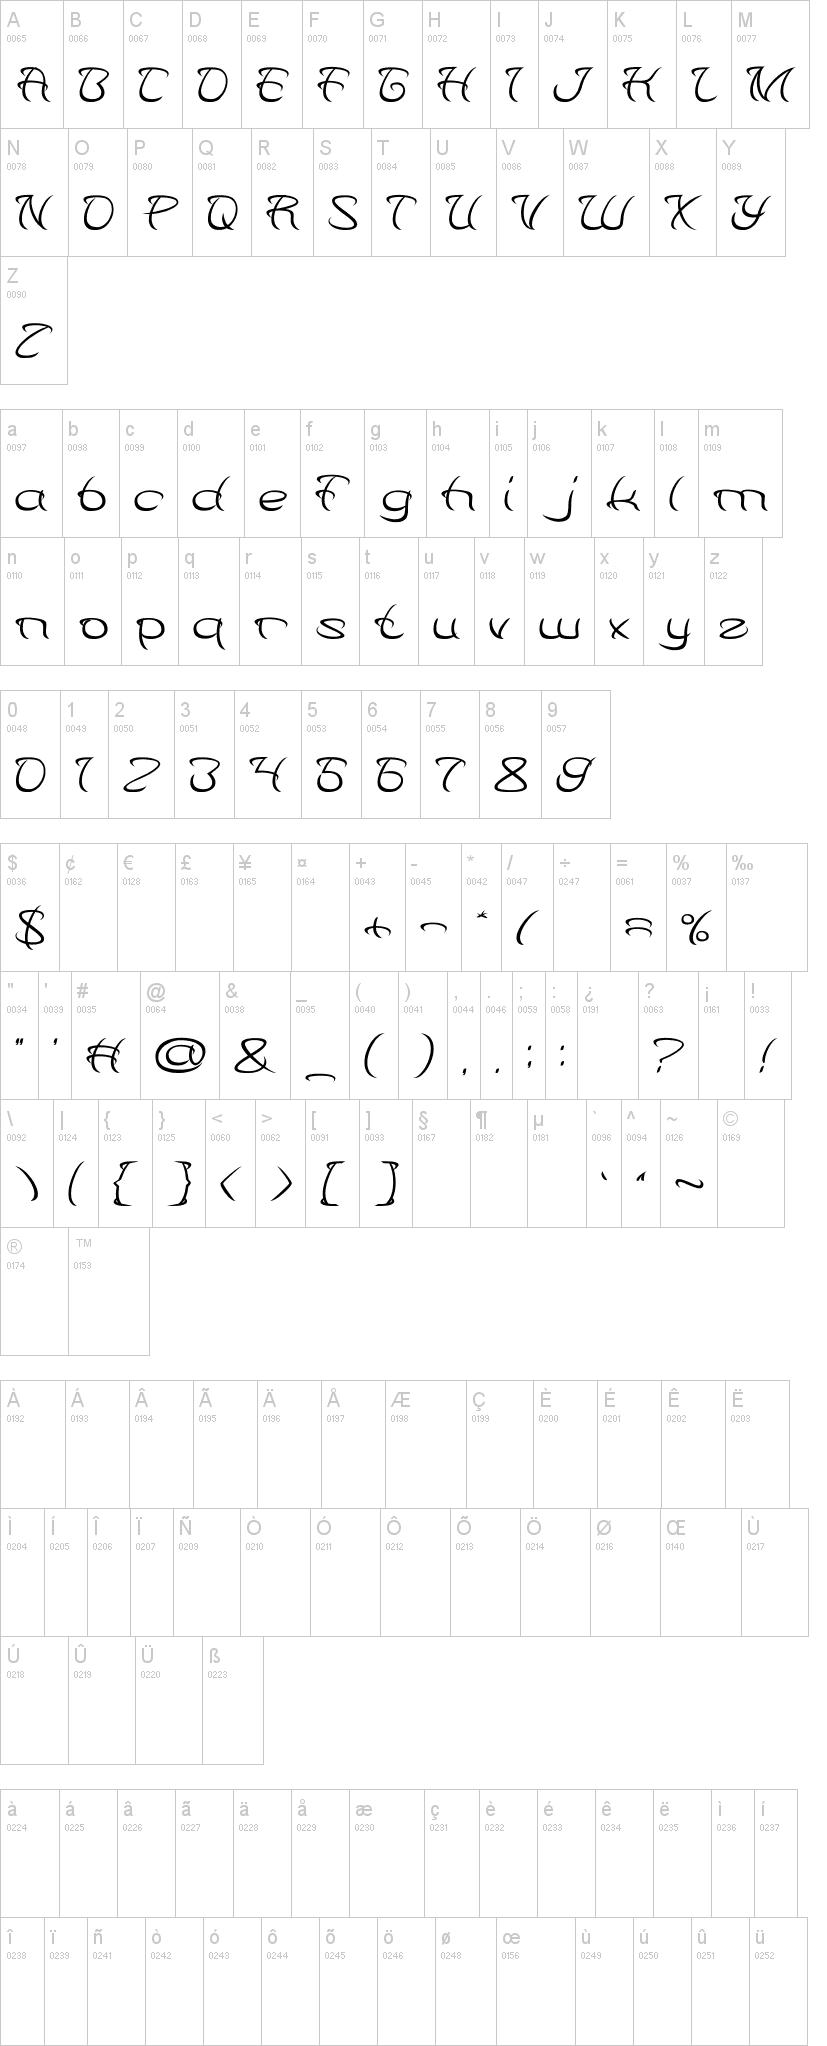 Kungfu Master Schriftart Dafontcom